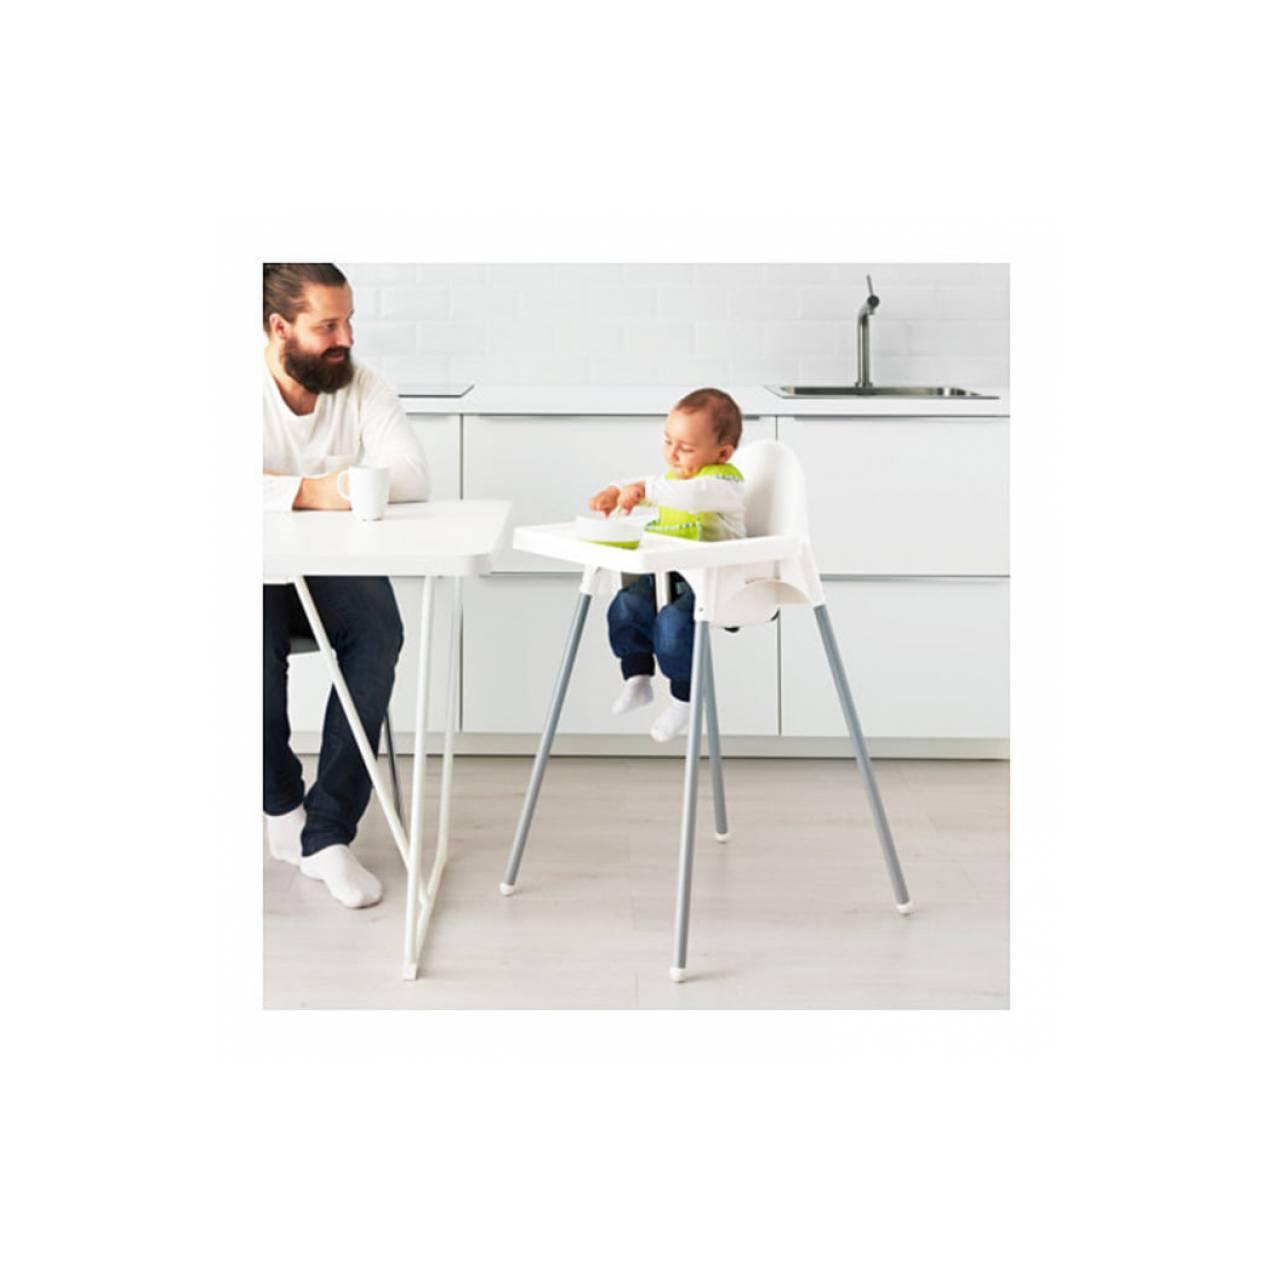 Kursi Makan Anak Bayi + Meja Baki IKEA ANTILOP Cafe Restaurant Rumah